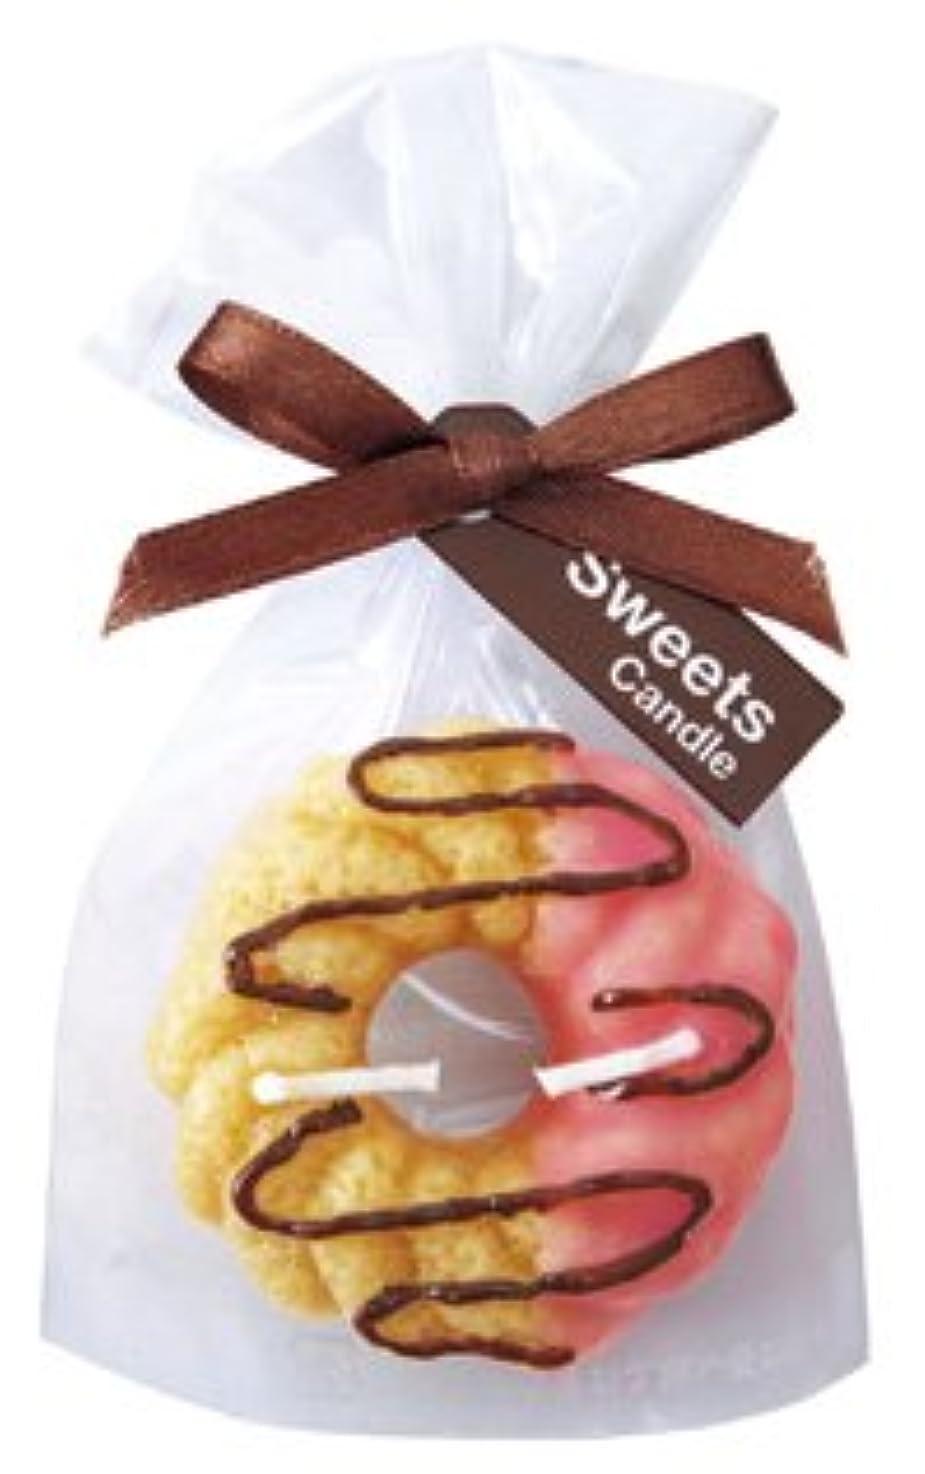 sweets candle(スイーツキャンドル) スイーツキャンドル プチスイーツキャンドル フレンチクルーラー BA636-05-84(A6360584)